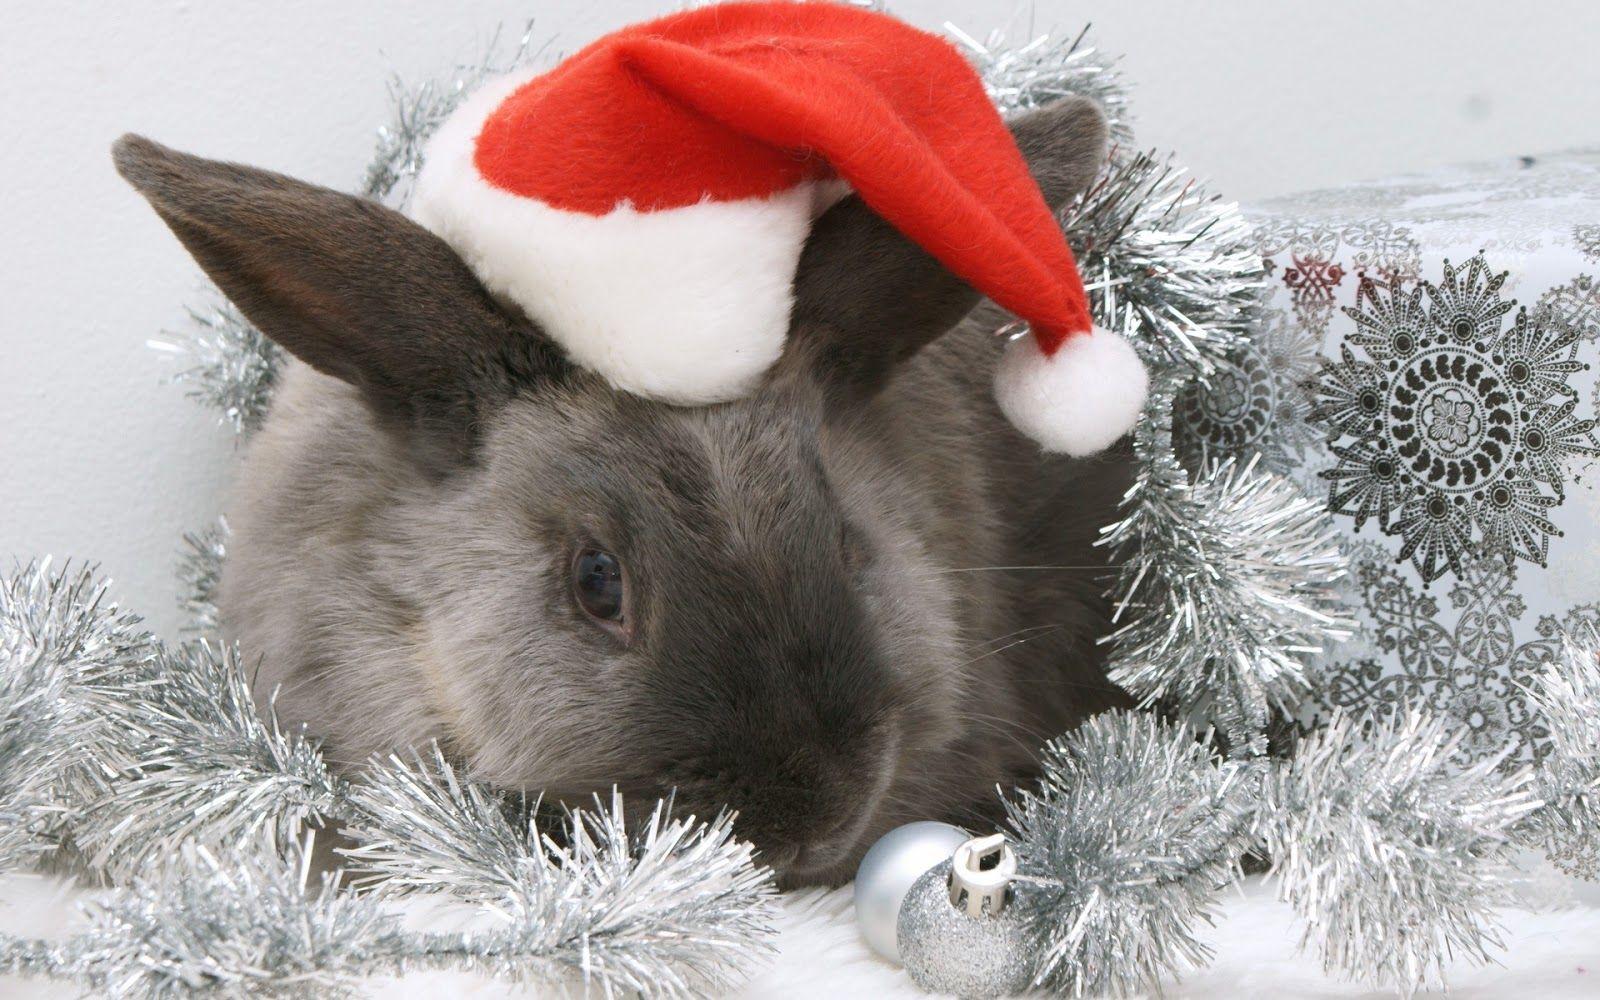 Wallpaper Christmas Animals Yahoo Image Search Results Christmas Animals Christmas Bunny Pets